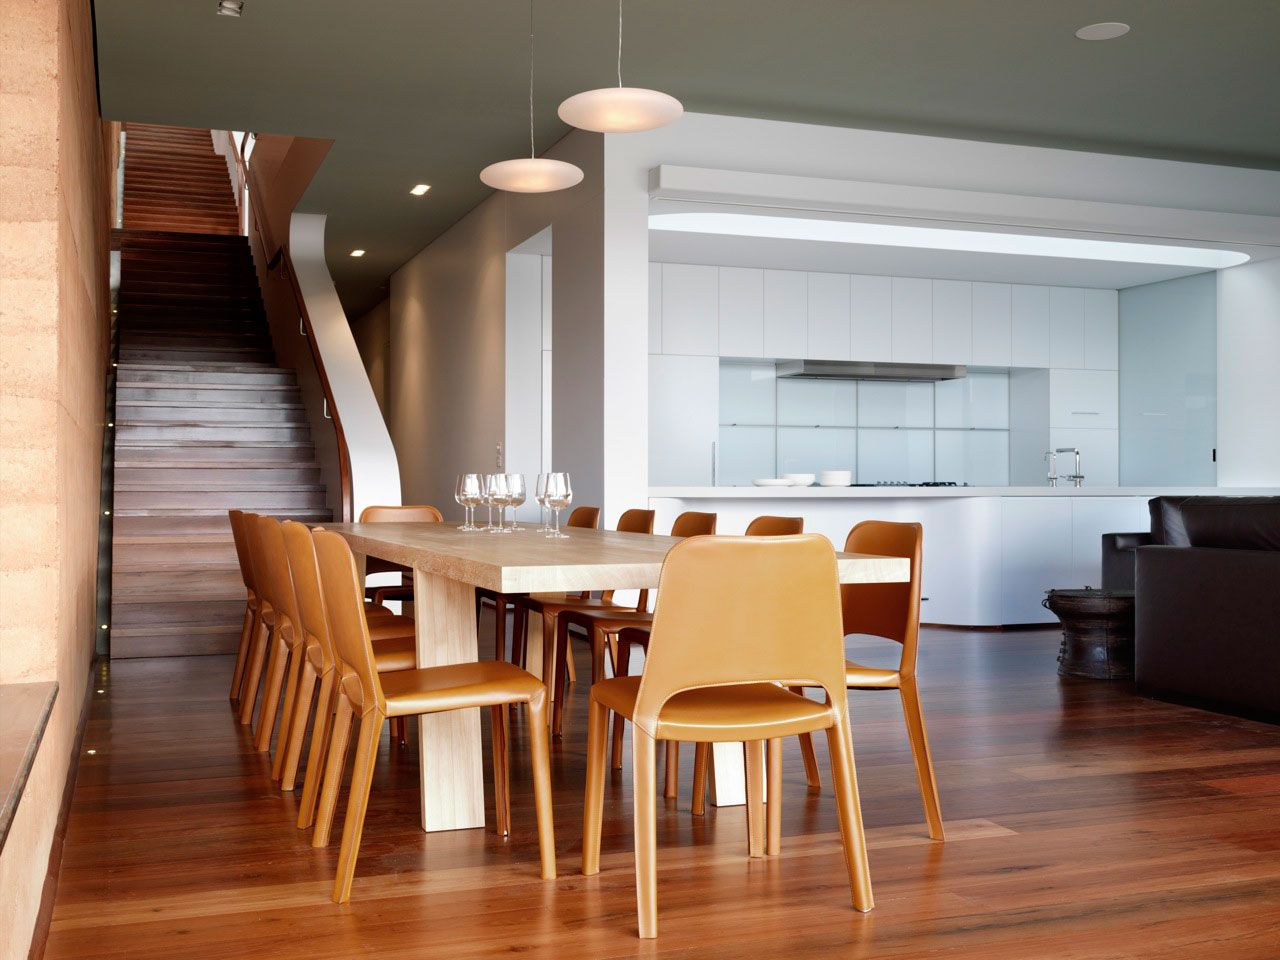 Elamang-Avenue-Residence-04-1